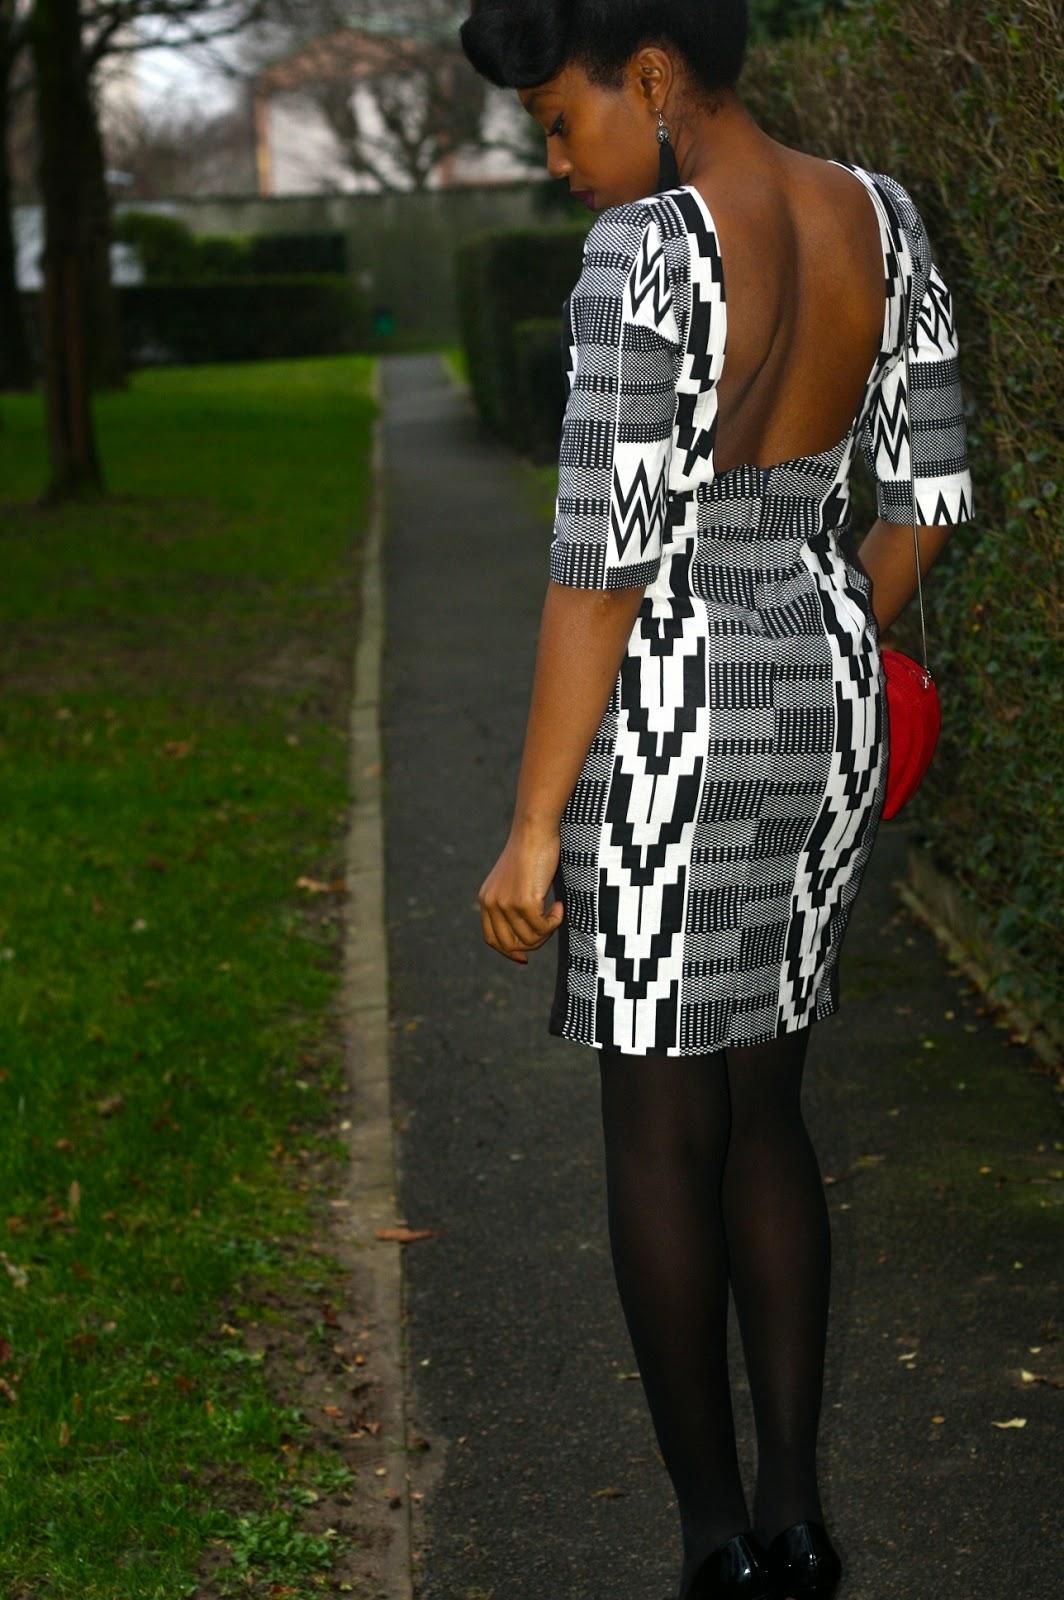 blackbeautybag blog beaut blog beaut noire my beauty event look. Black Bedroom Furniture Sets. Home Design Ideas